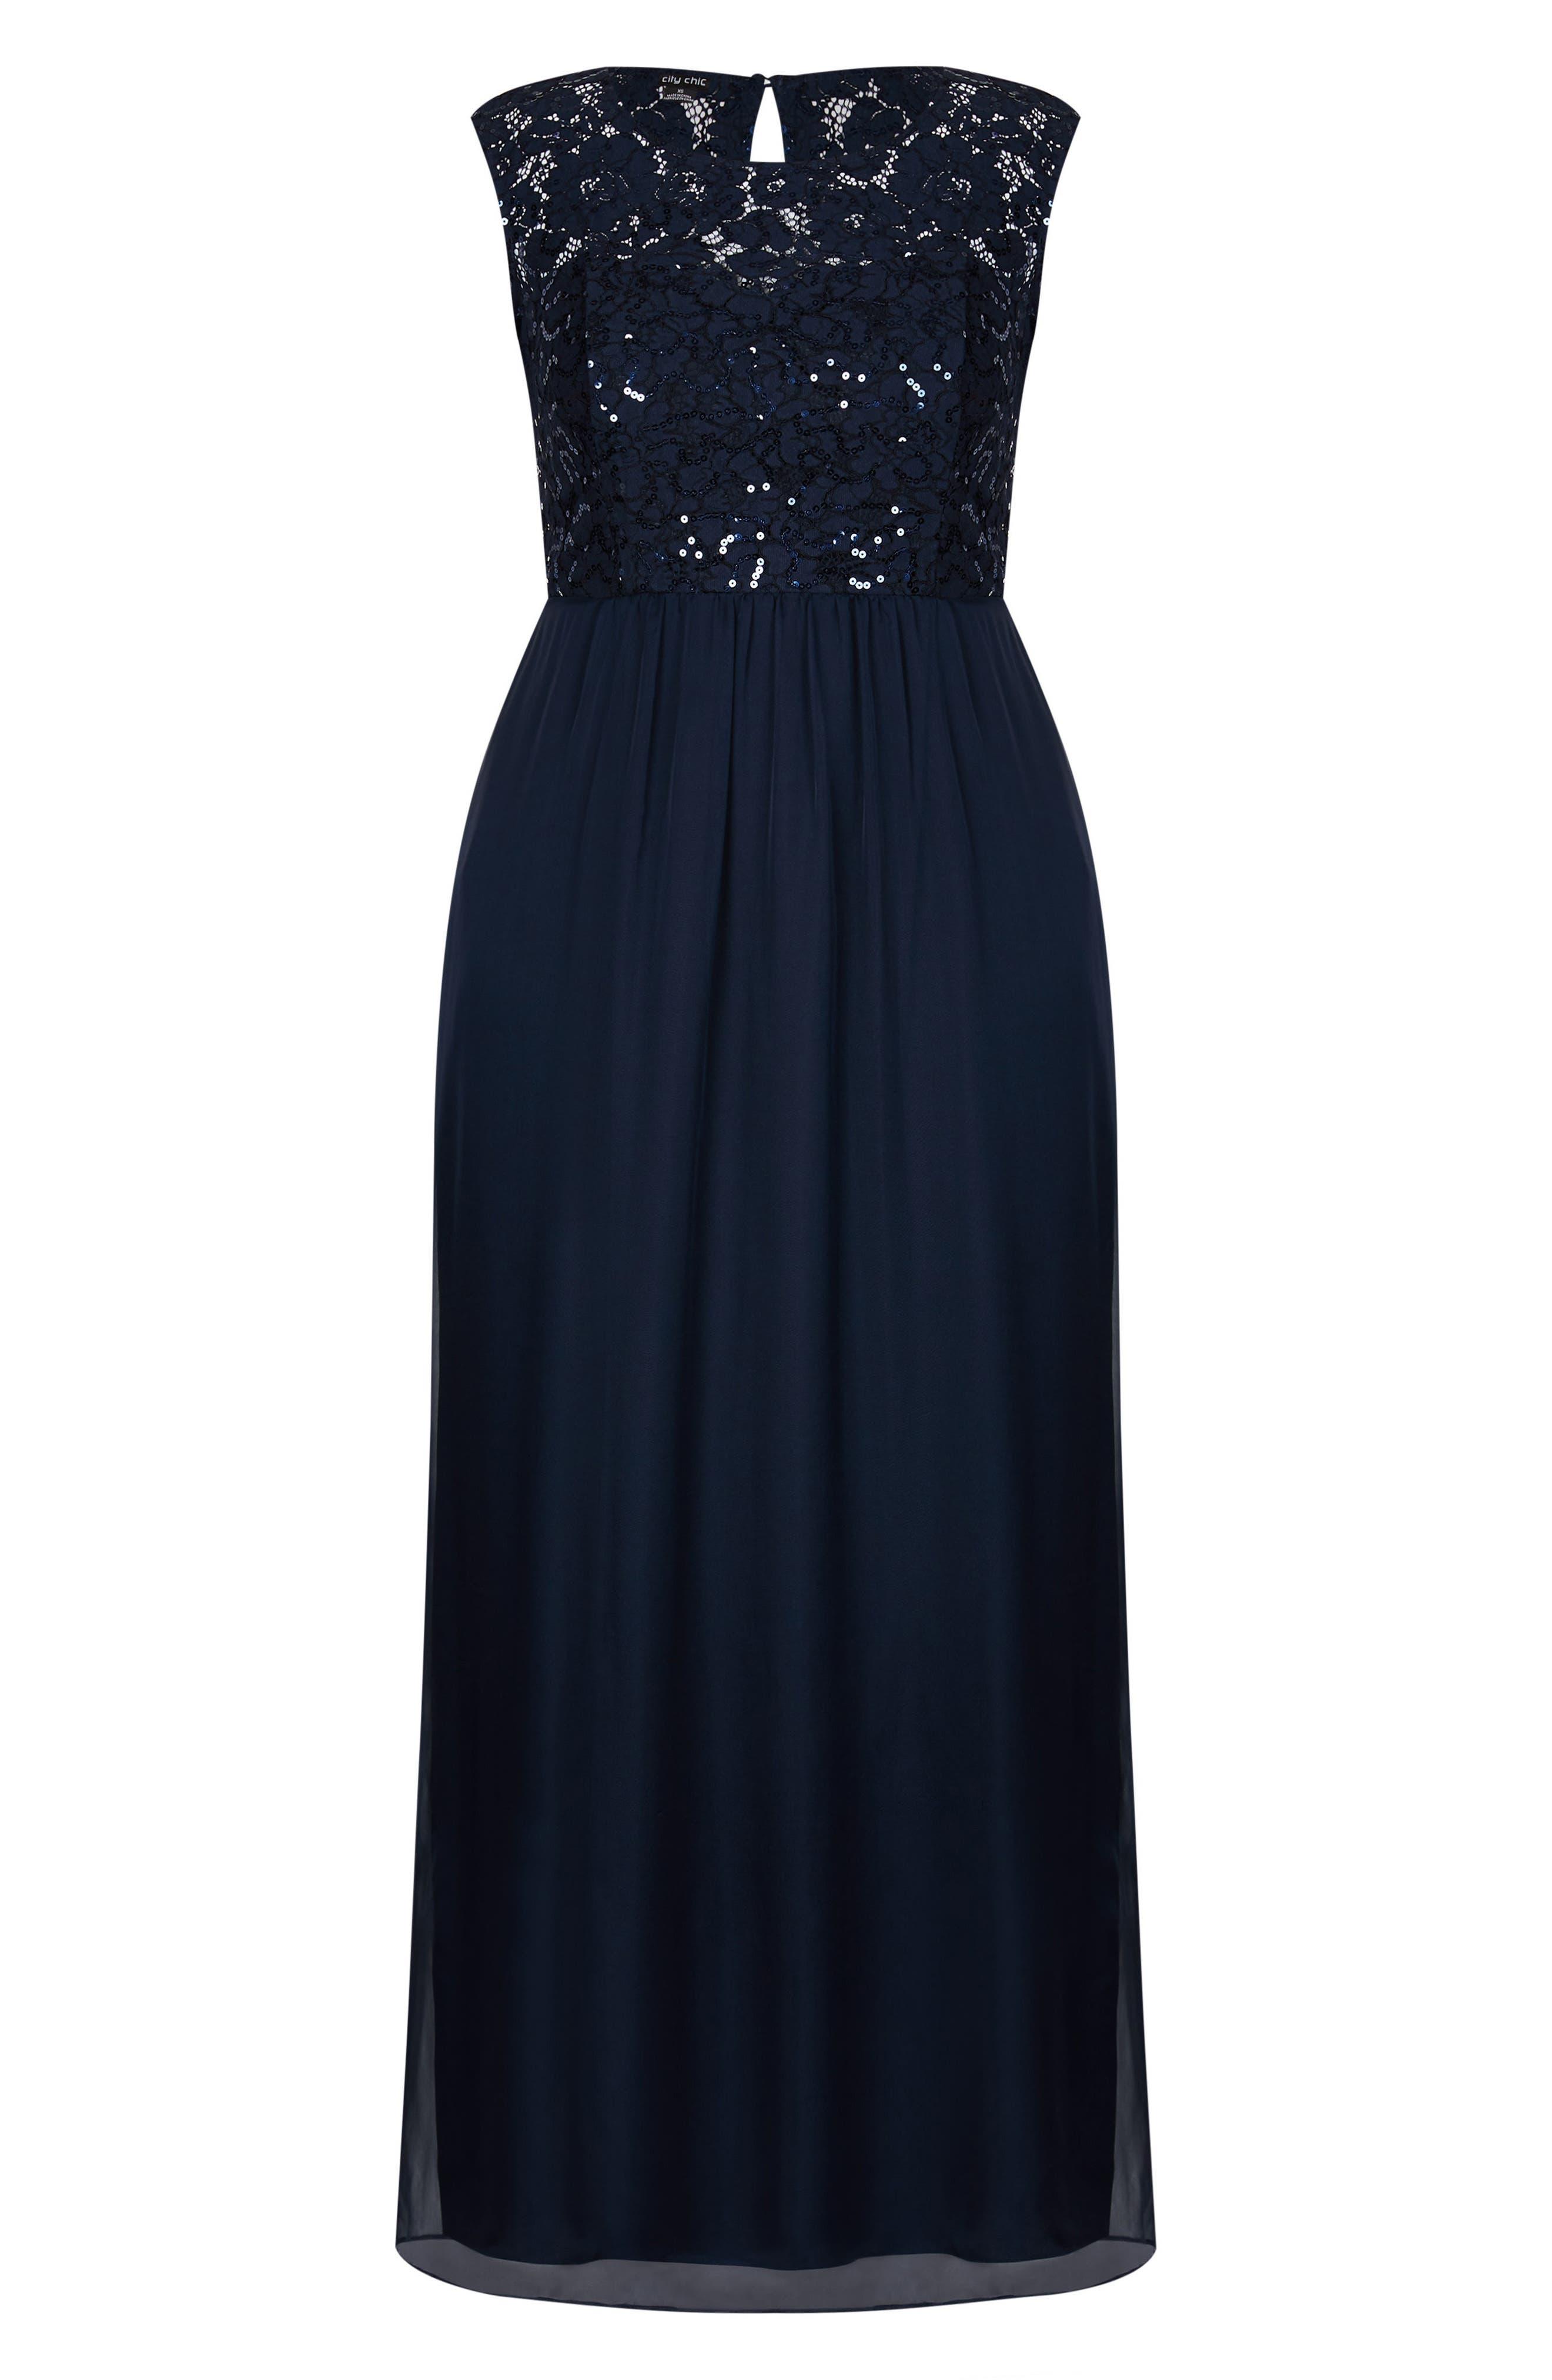 Sweet Love Maxi Dress,                             Alternate thumbnail 3, color,                             Navy